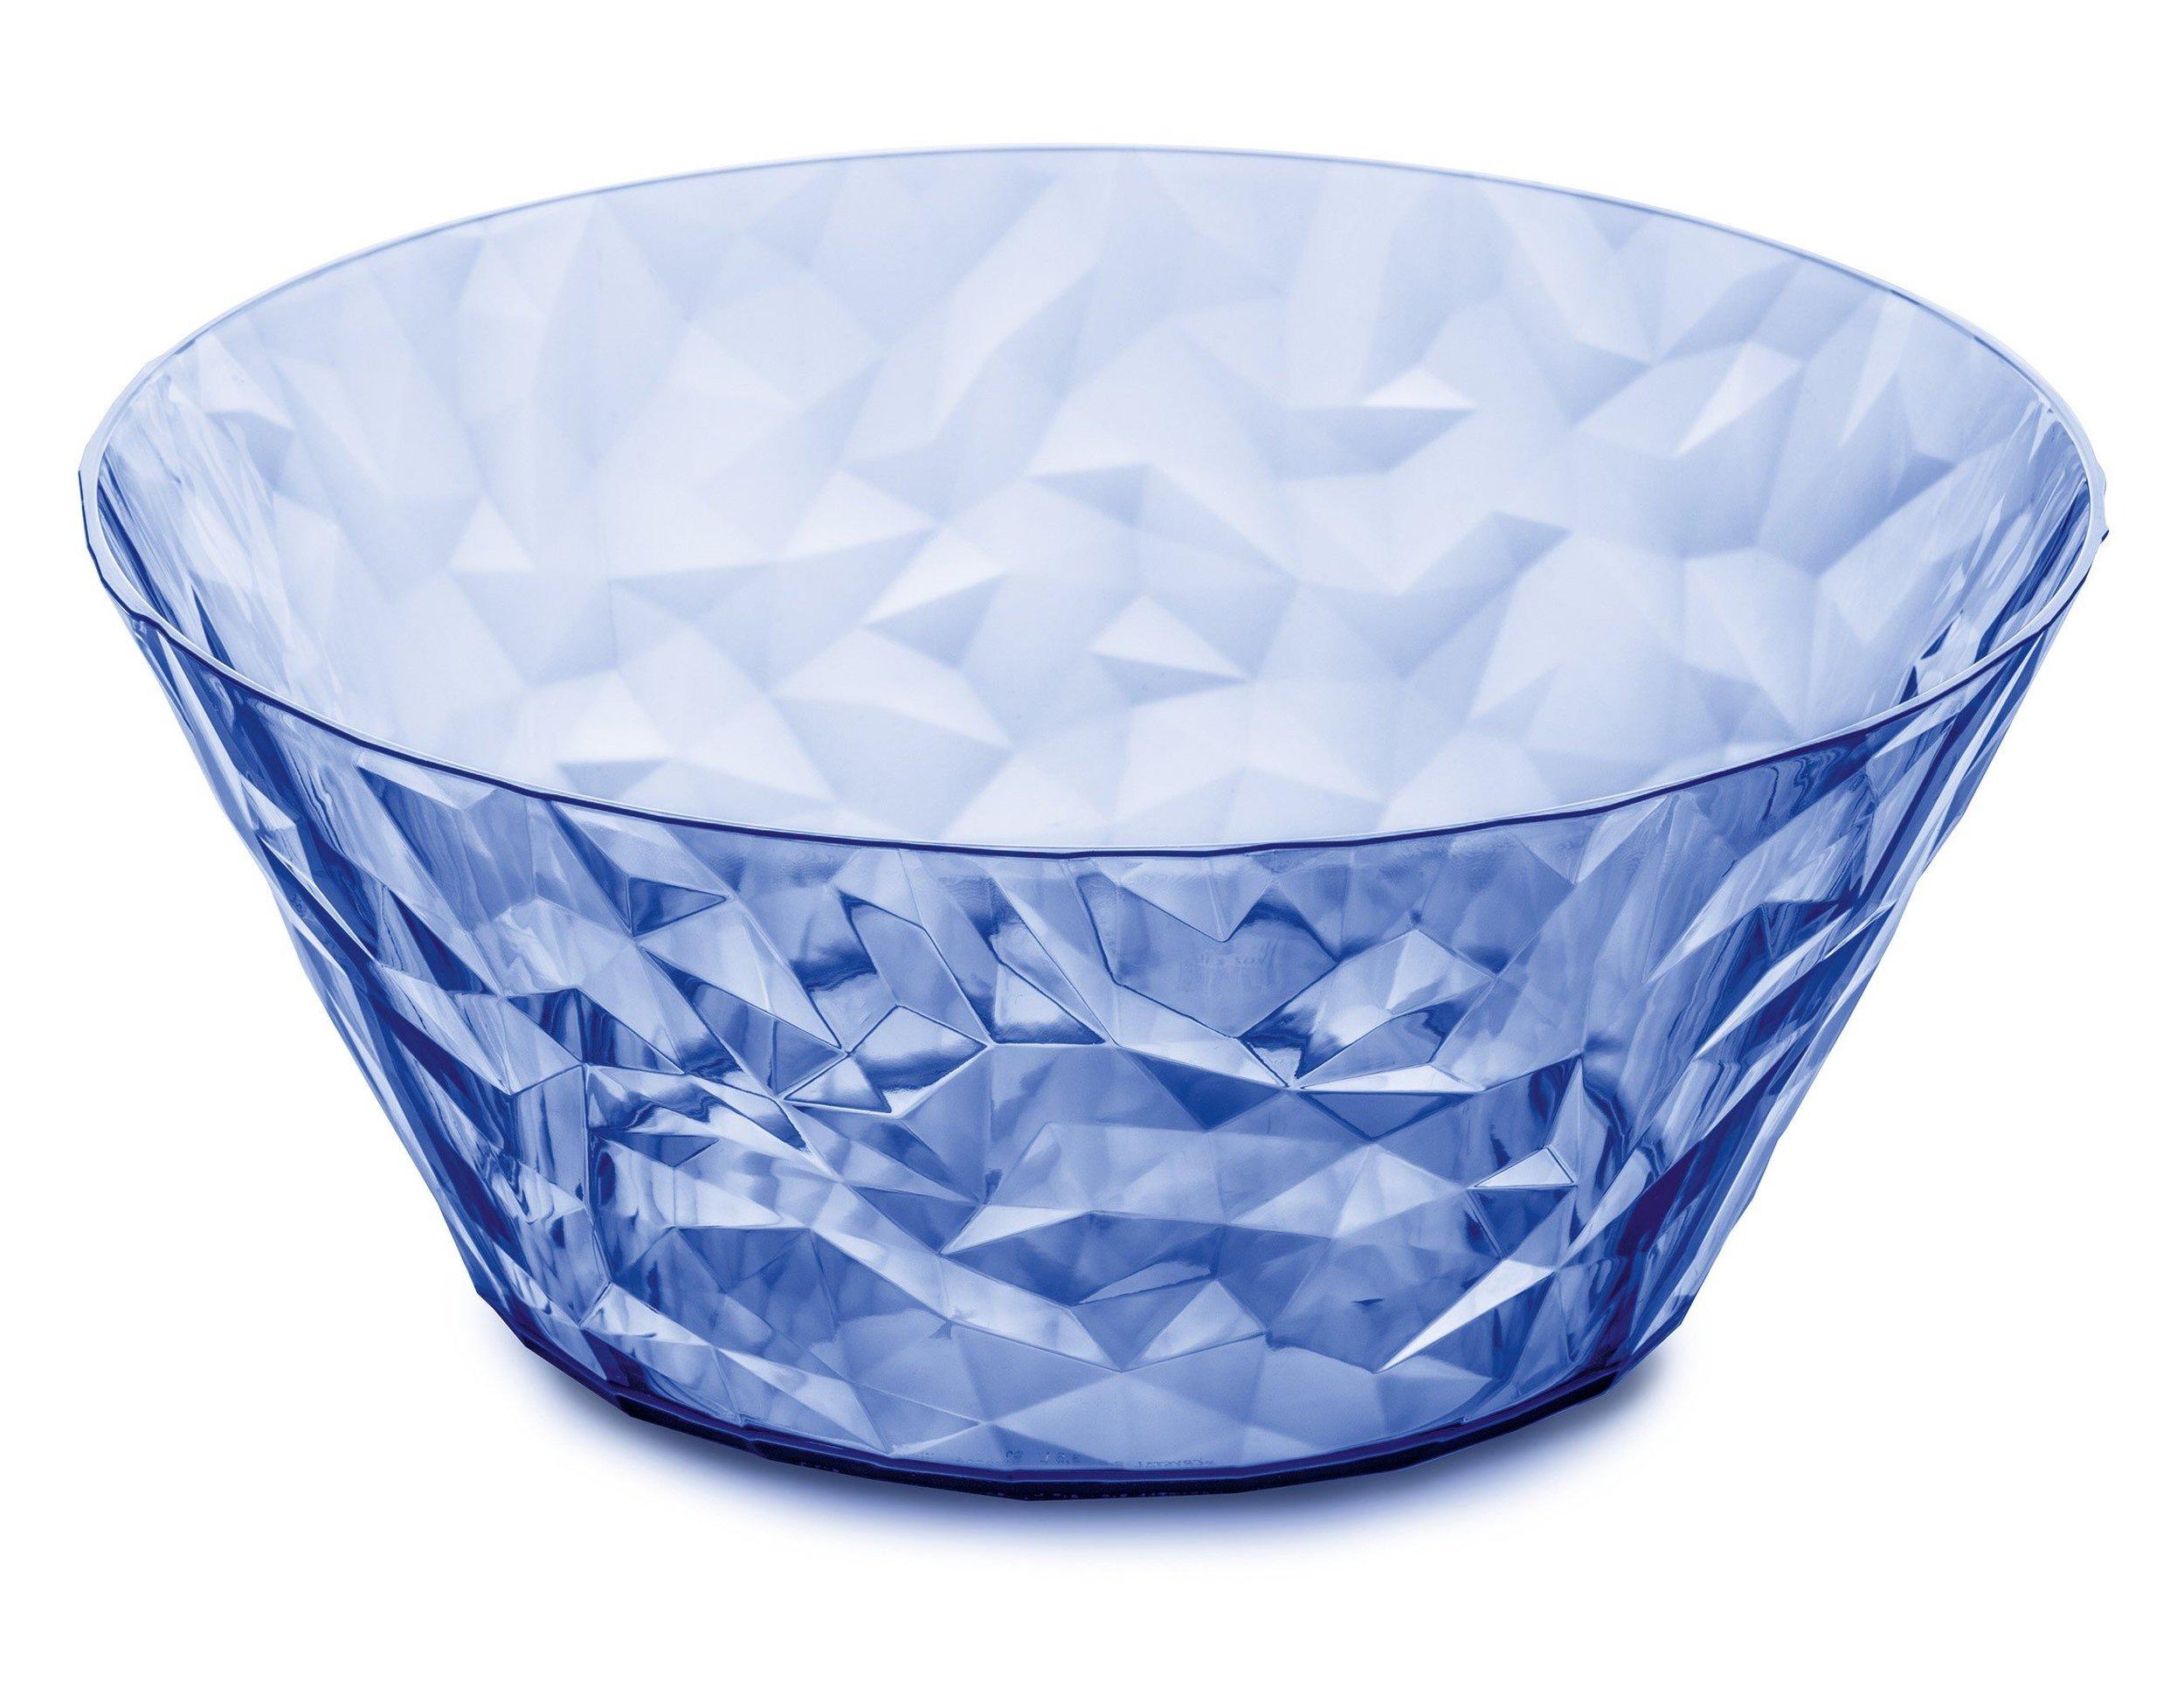 Misa sałatkowa Crystal 2.0 jasnoniebieska